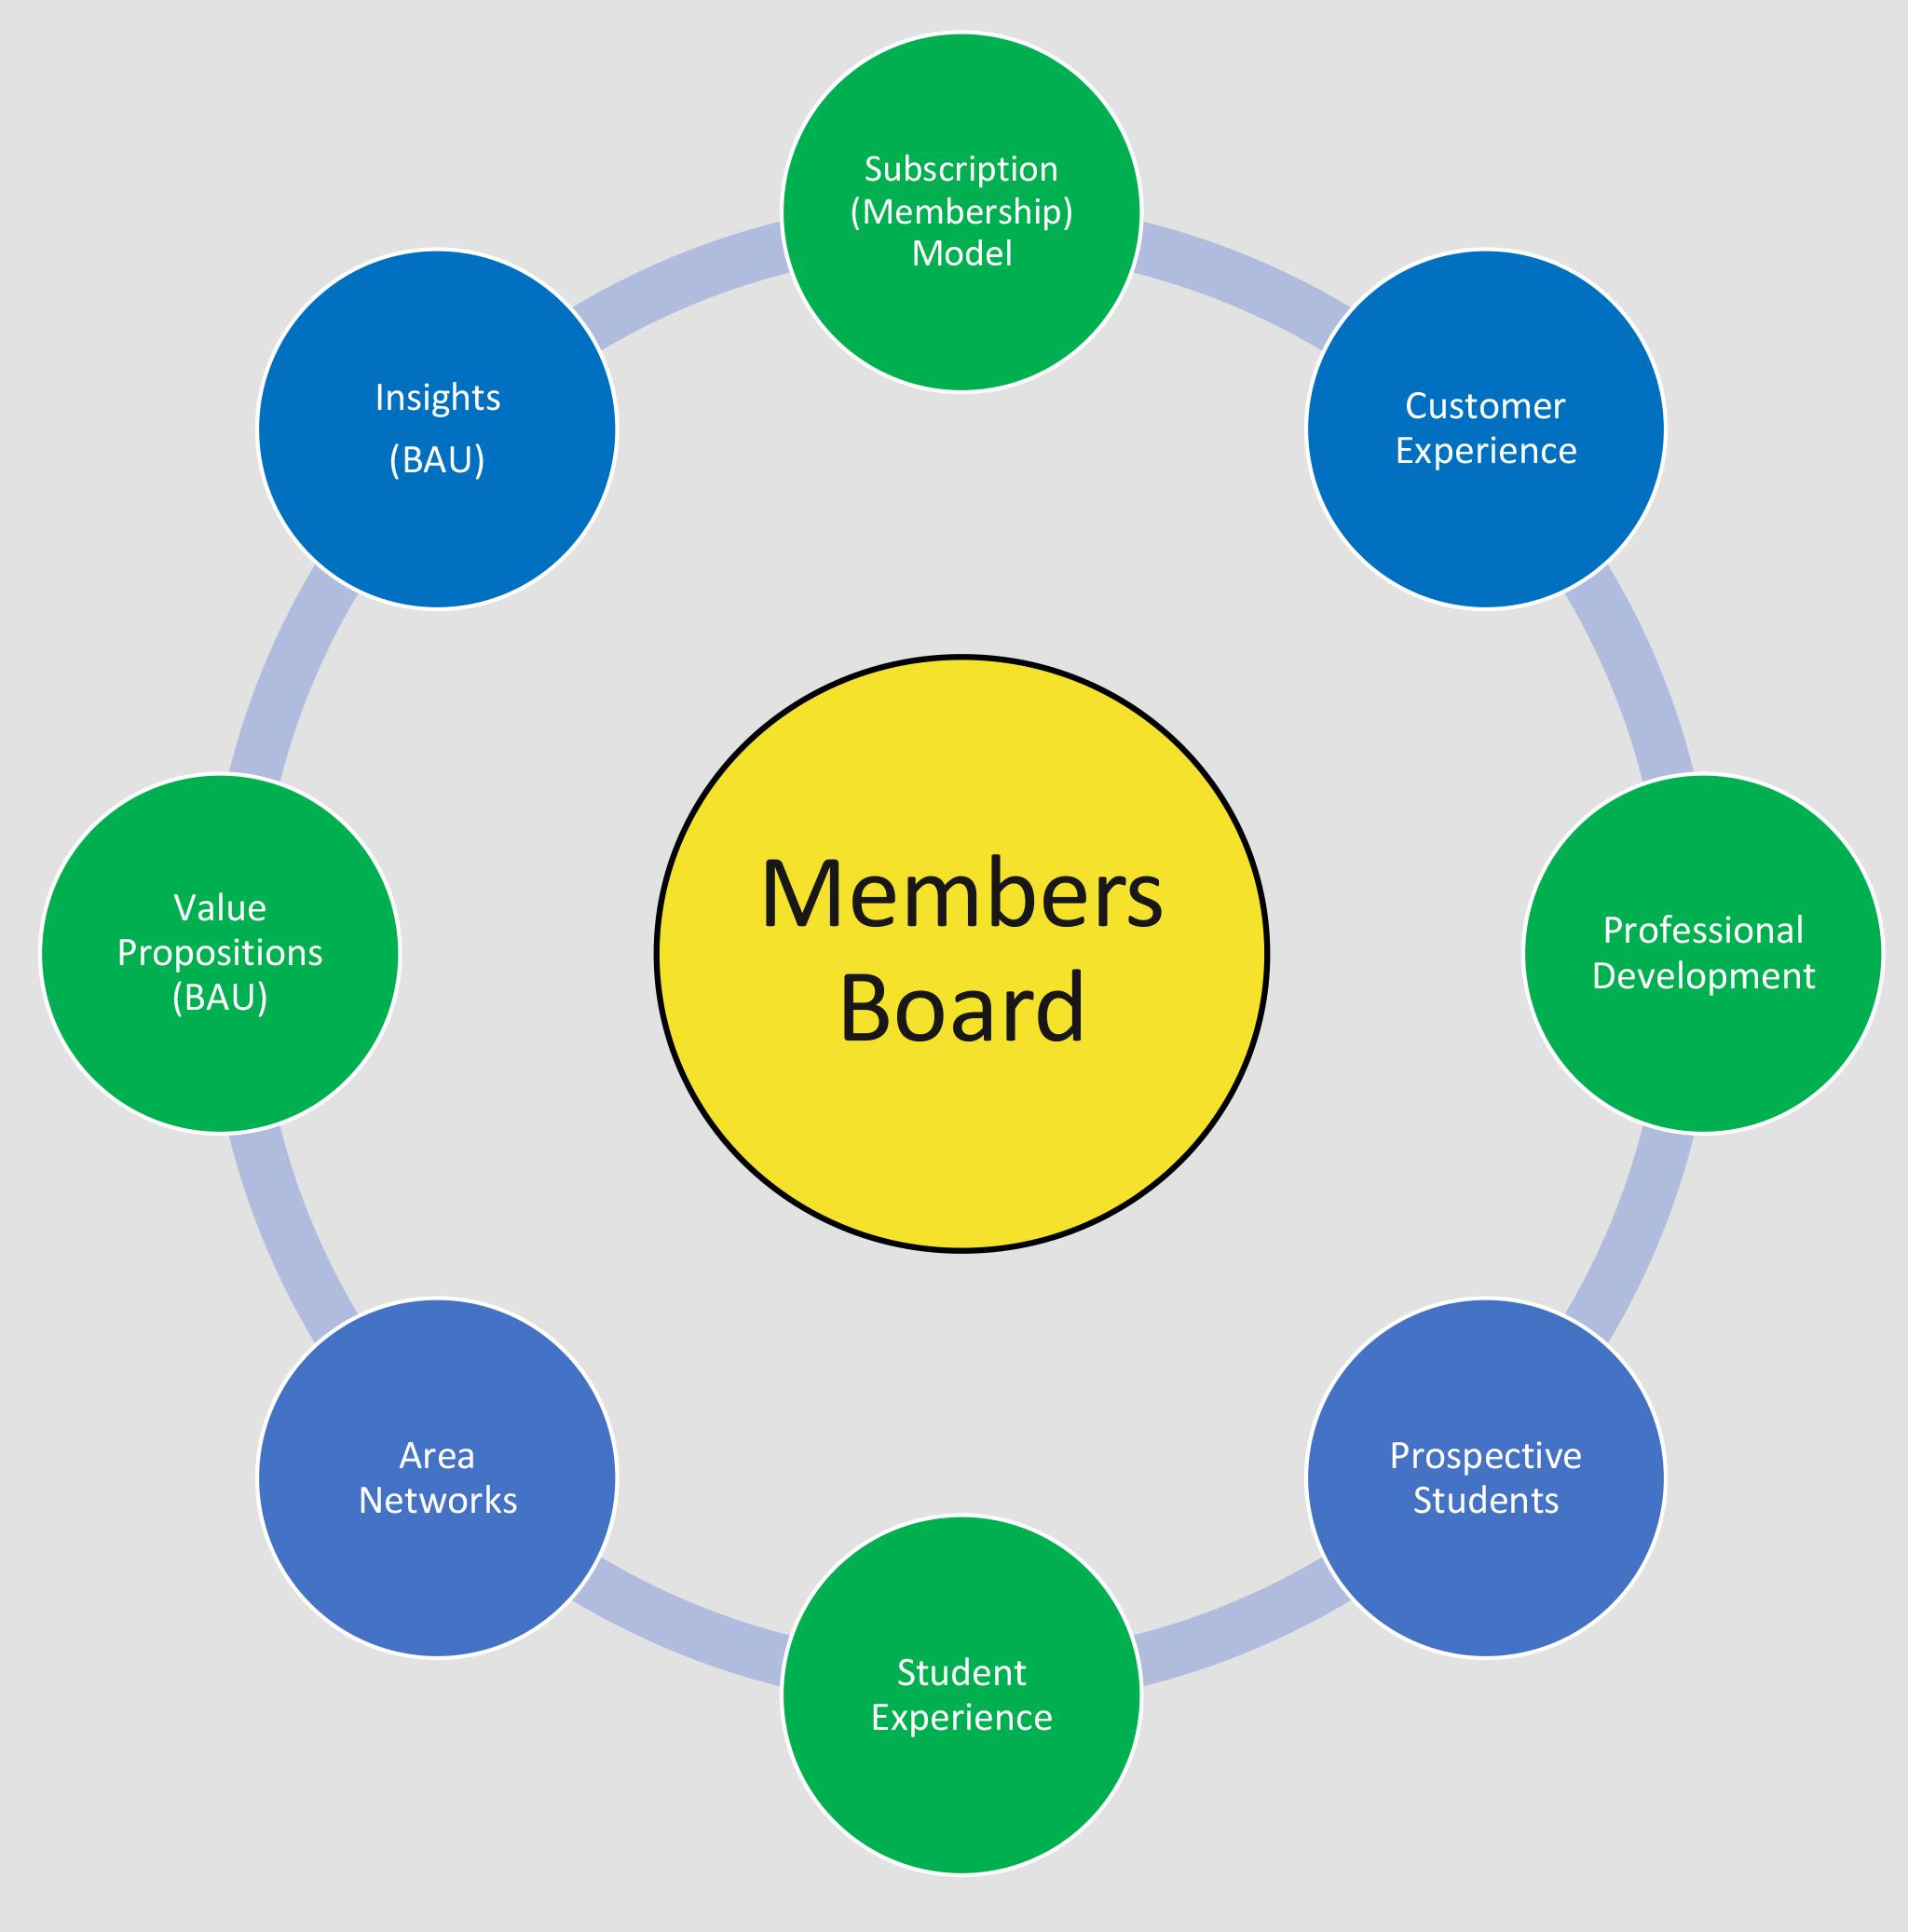 Members Board priority areas